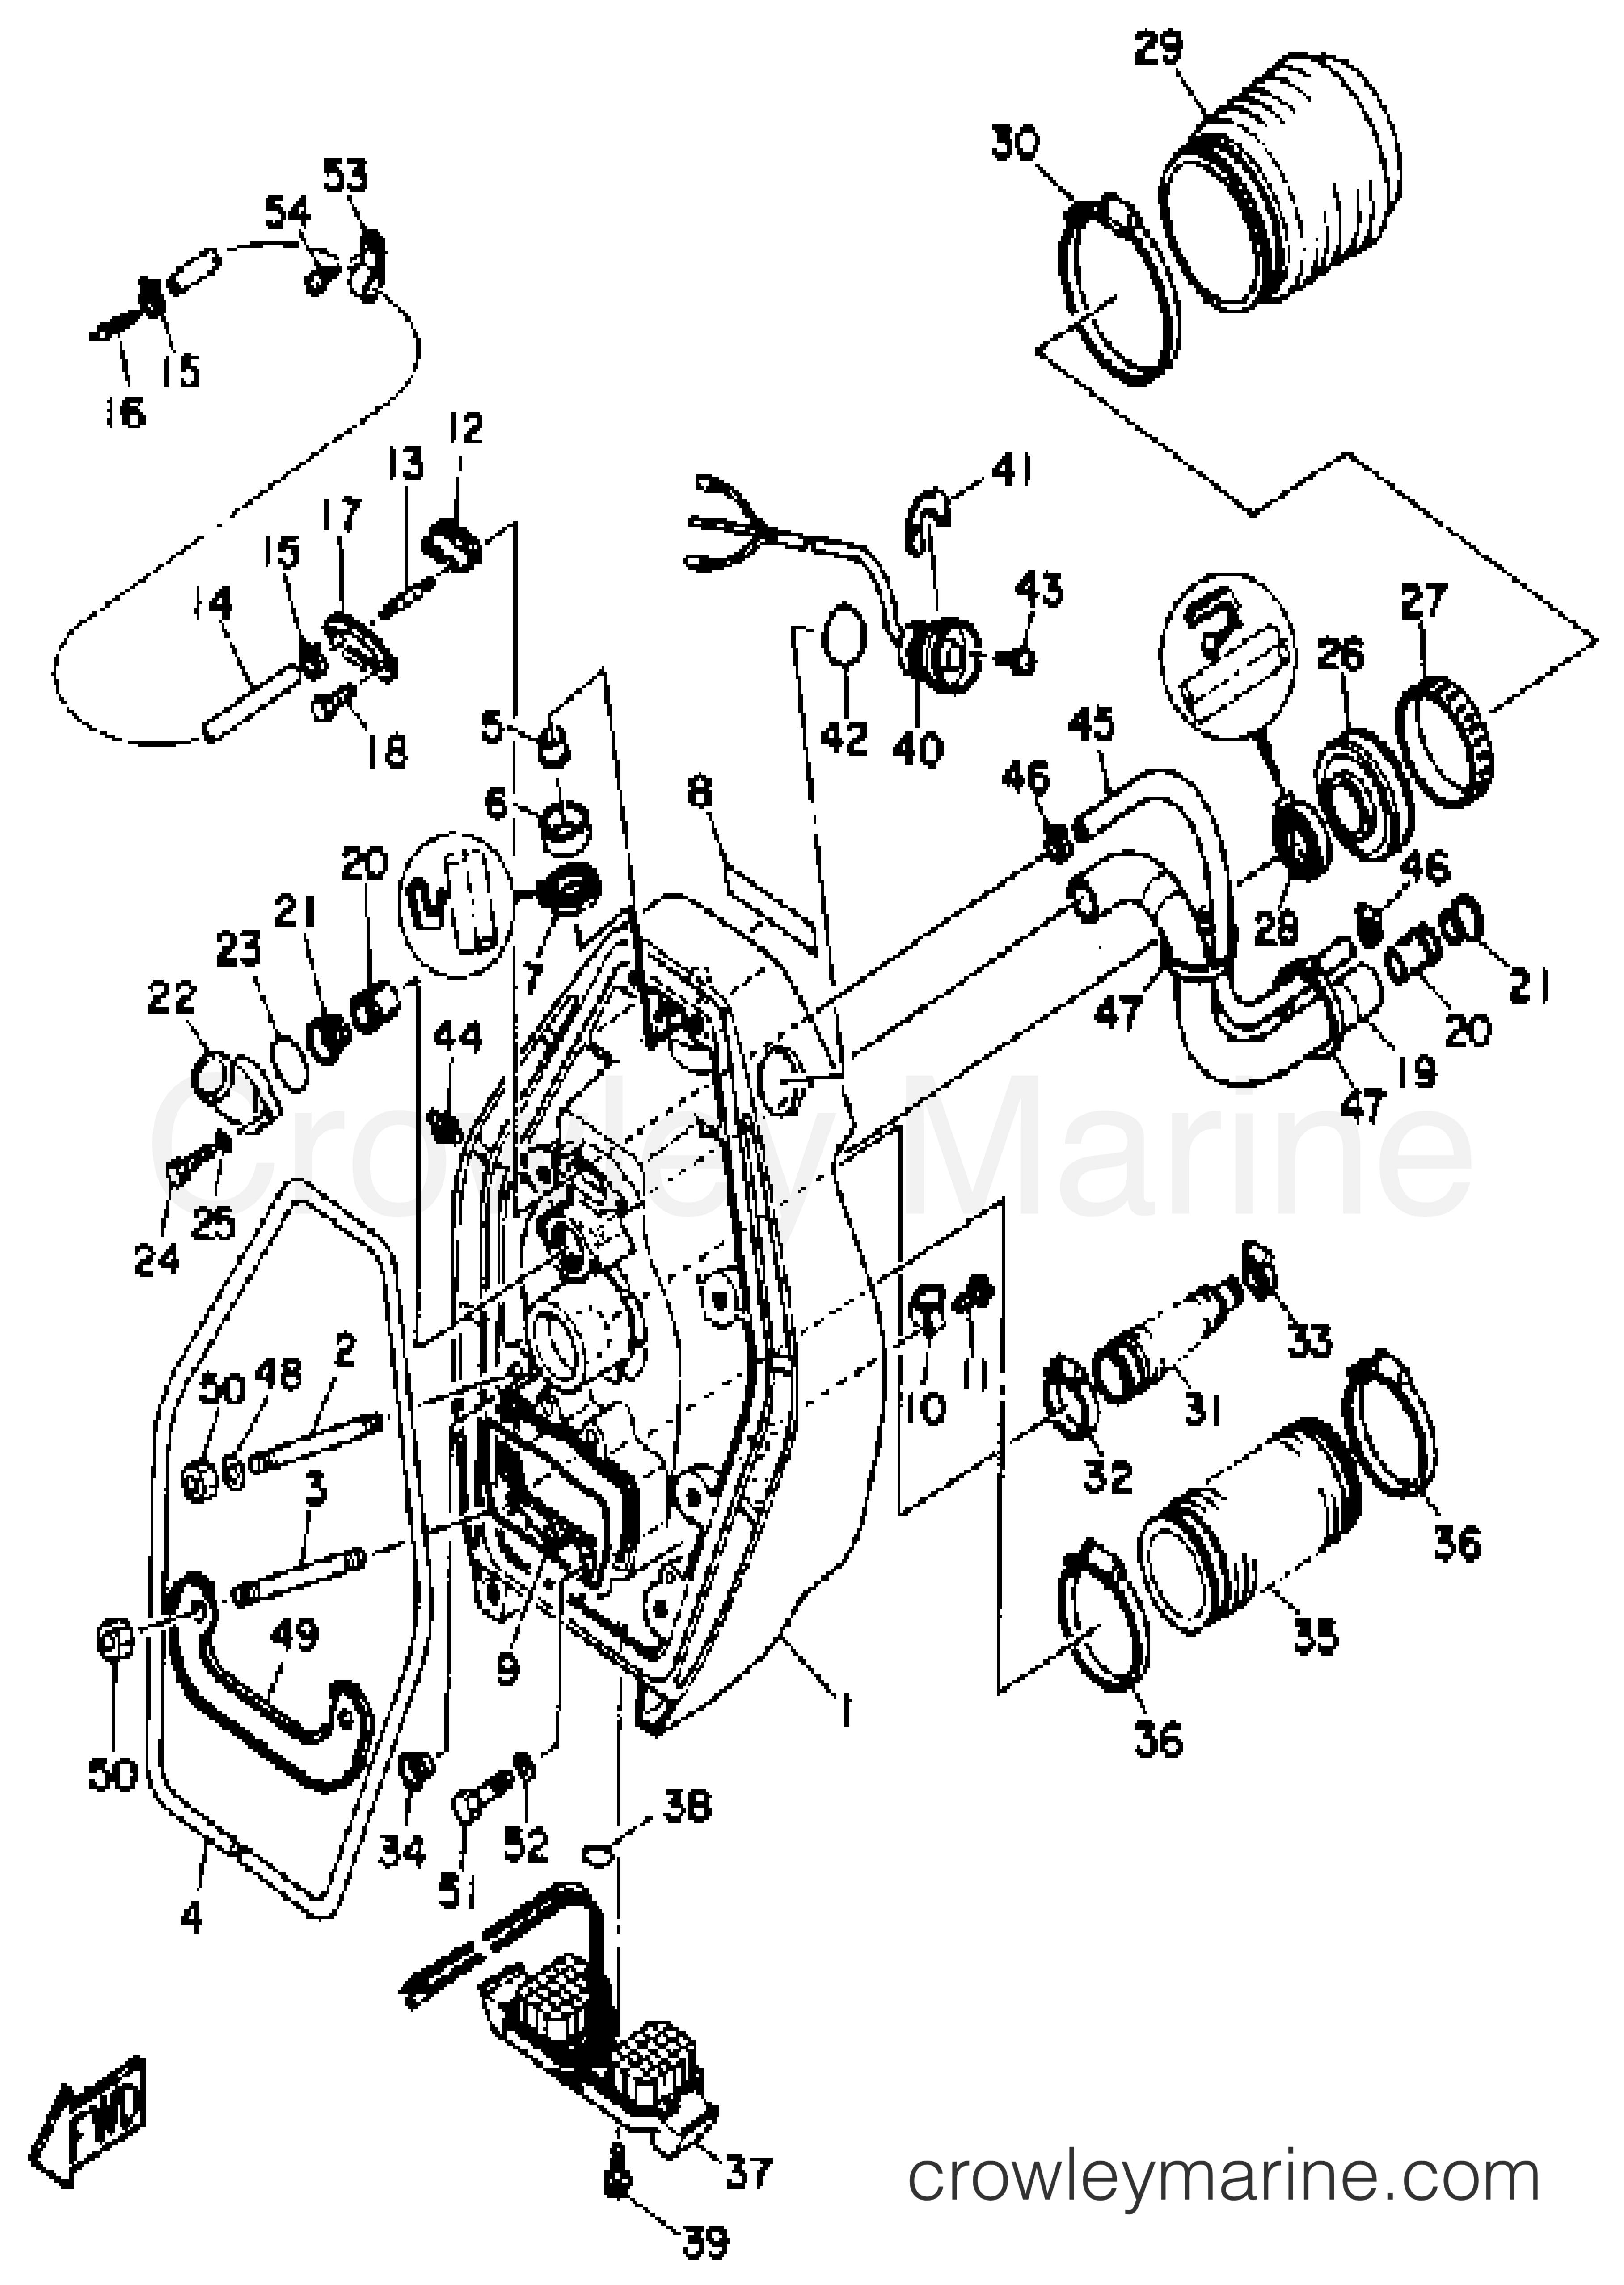 marine engine diagram stern allroad fuse diagram vw 1600 engine diagram sensor location